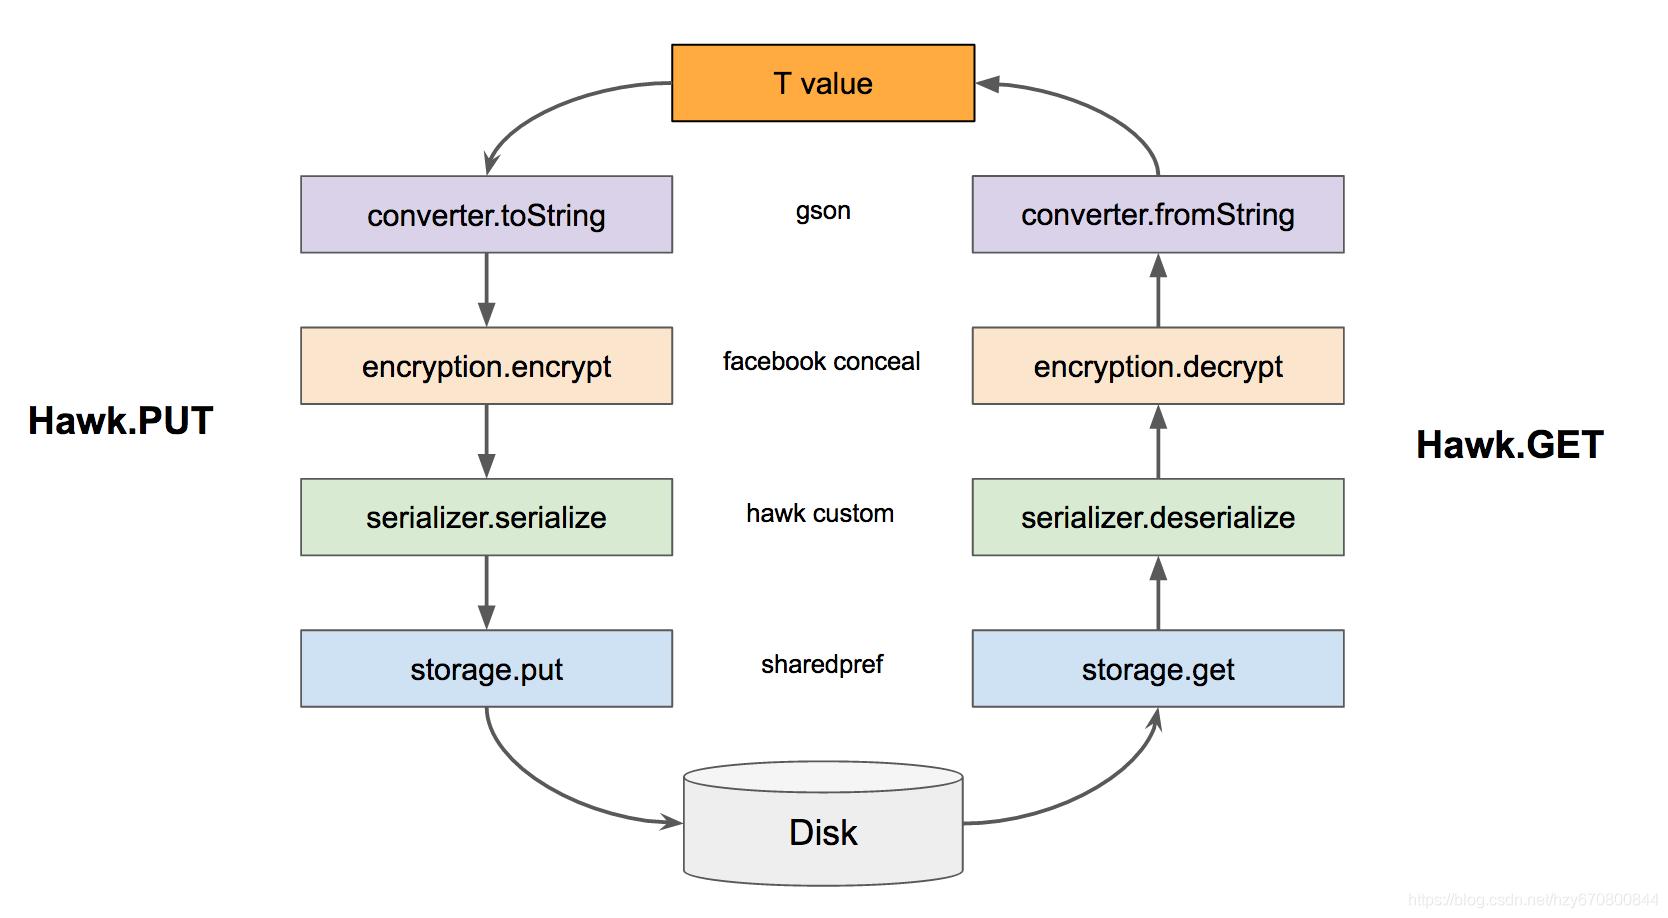 Android Hawk資料庫的原始碼解析,Github開源專案,基於